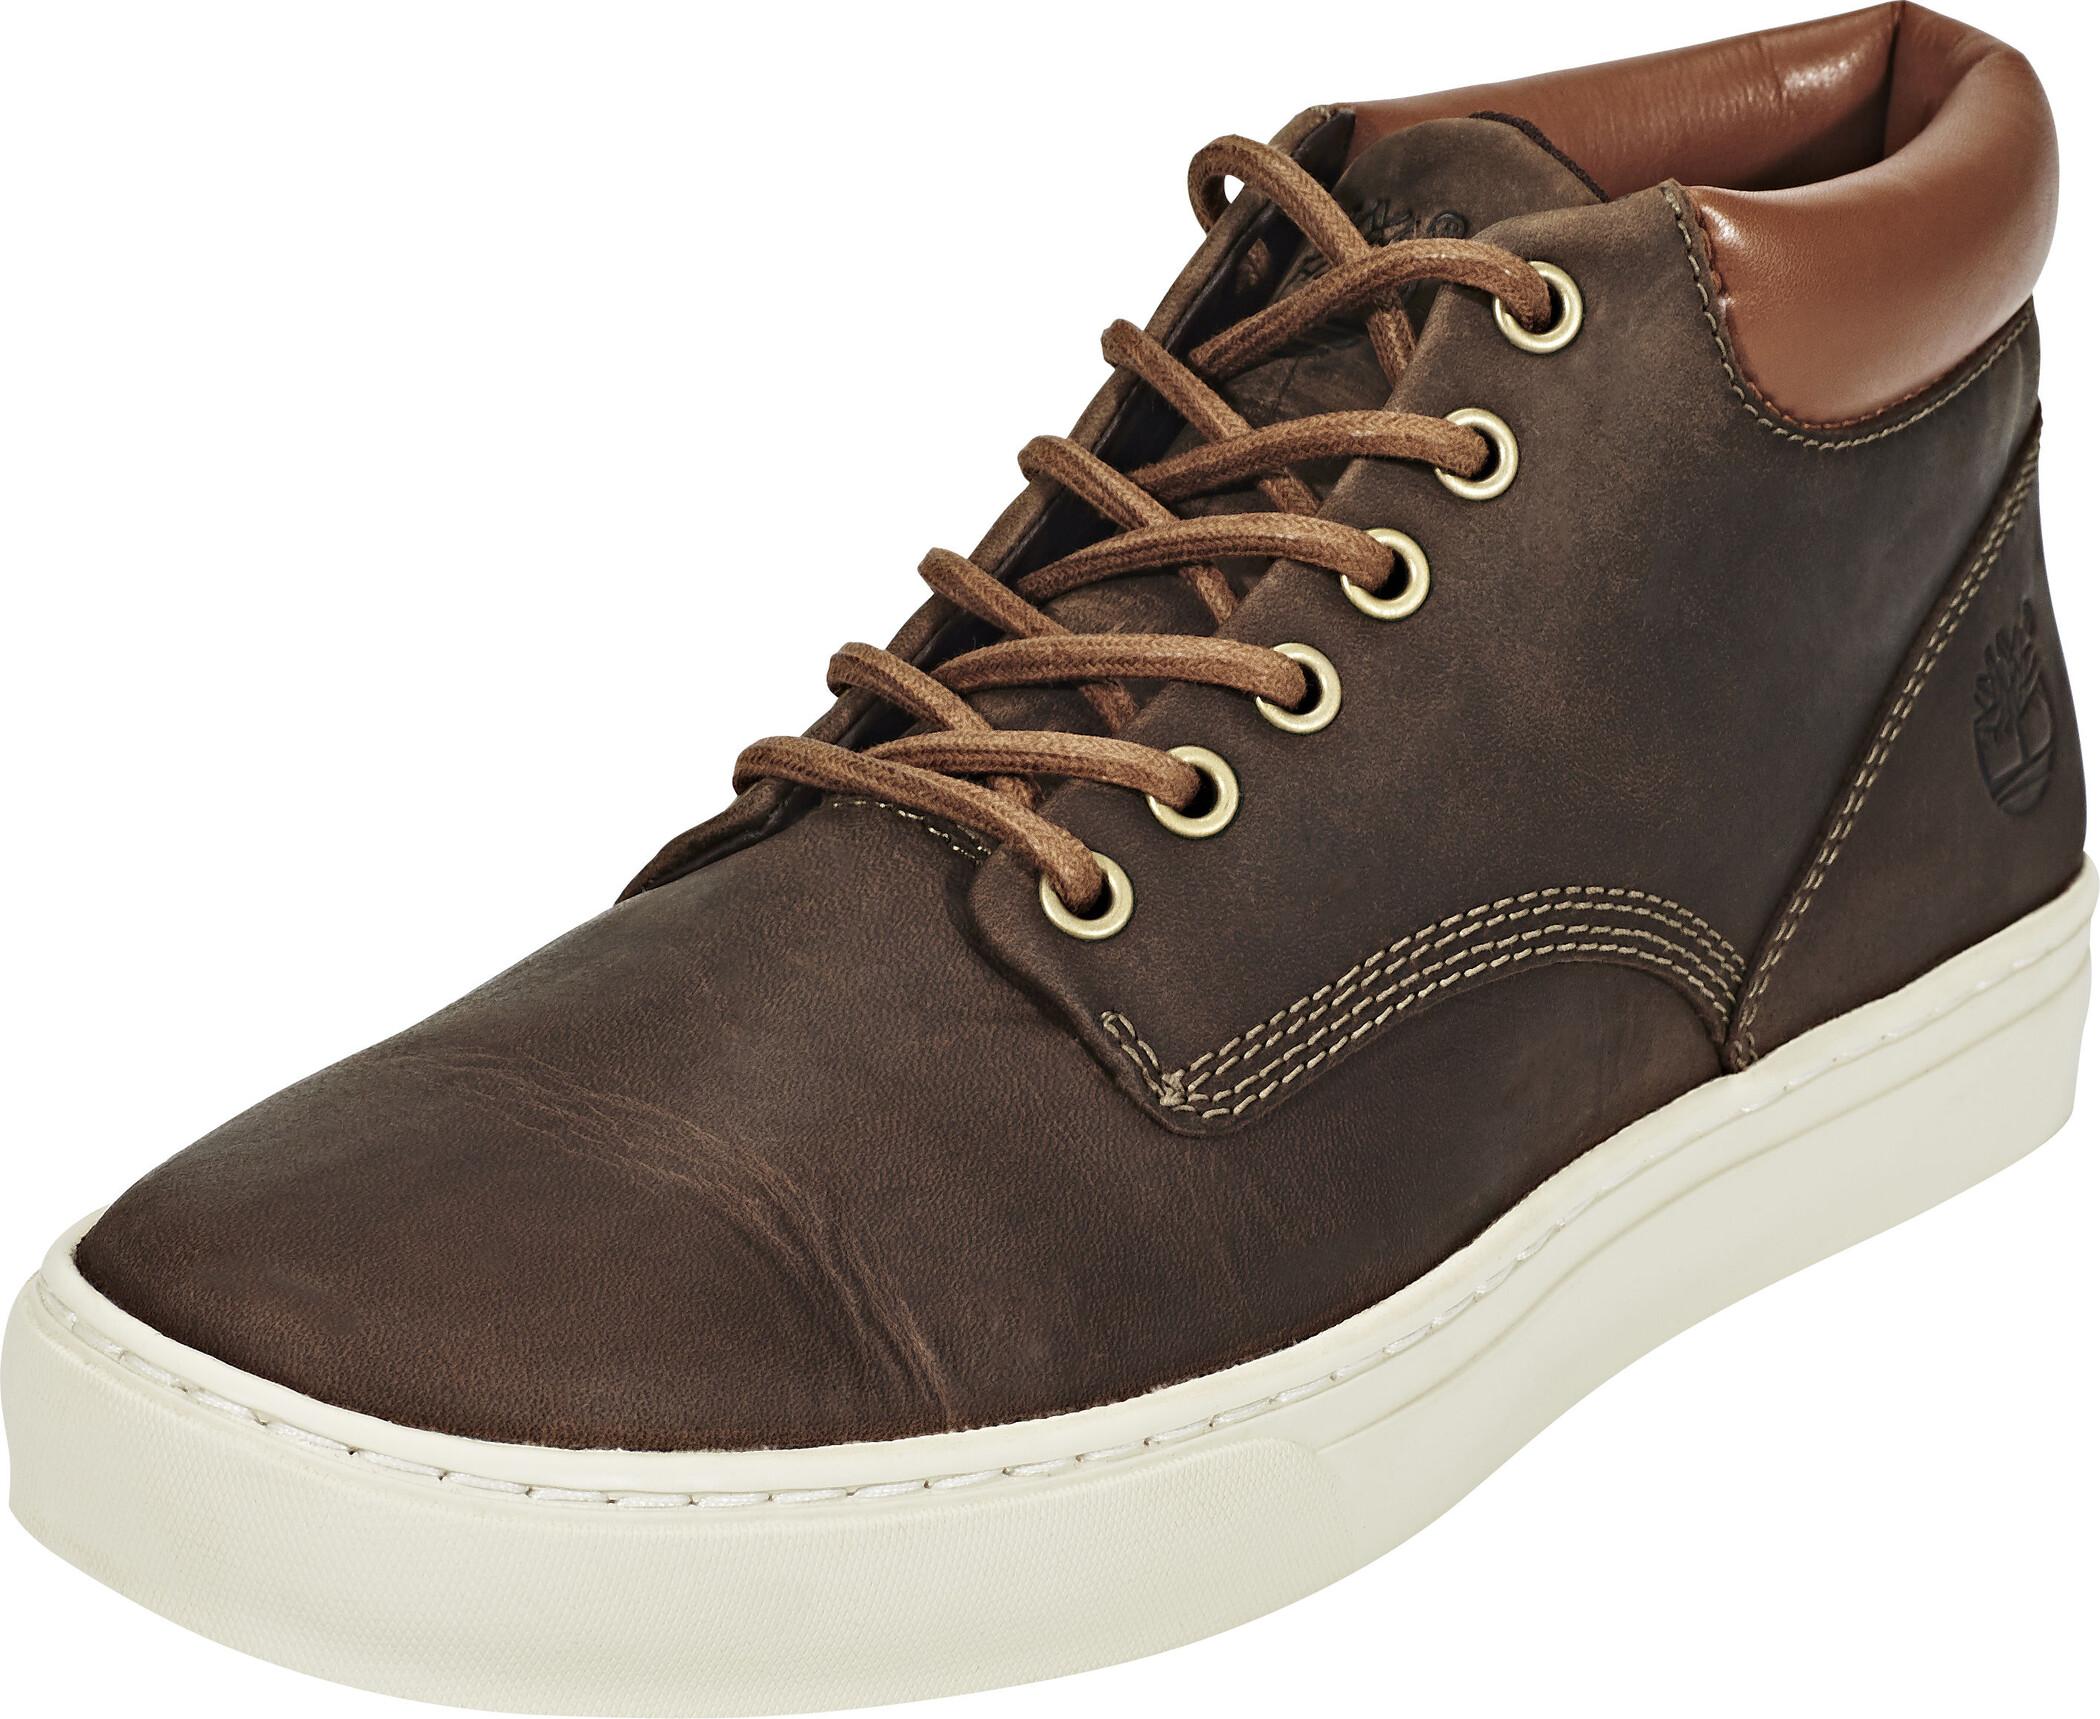 premium selection b1058 d6b09 Timberland Adventure 2 0 Cupsole Chukka Shoes Men Dark Olive Roughcut.jpg